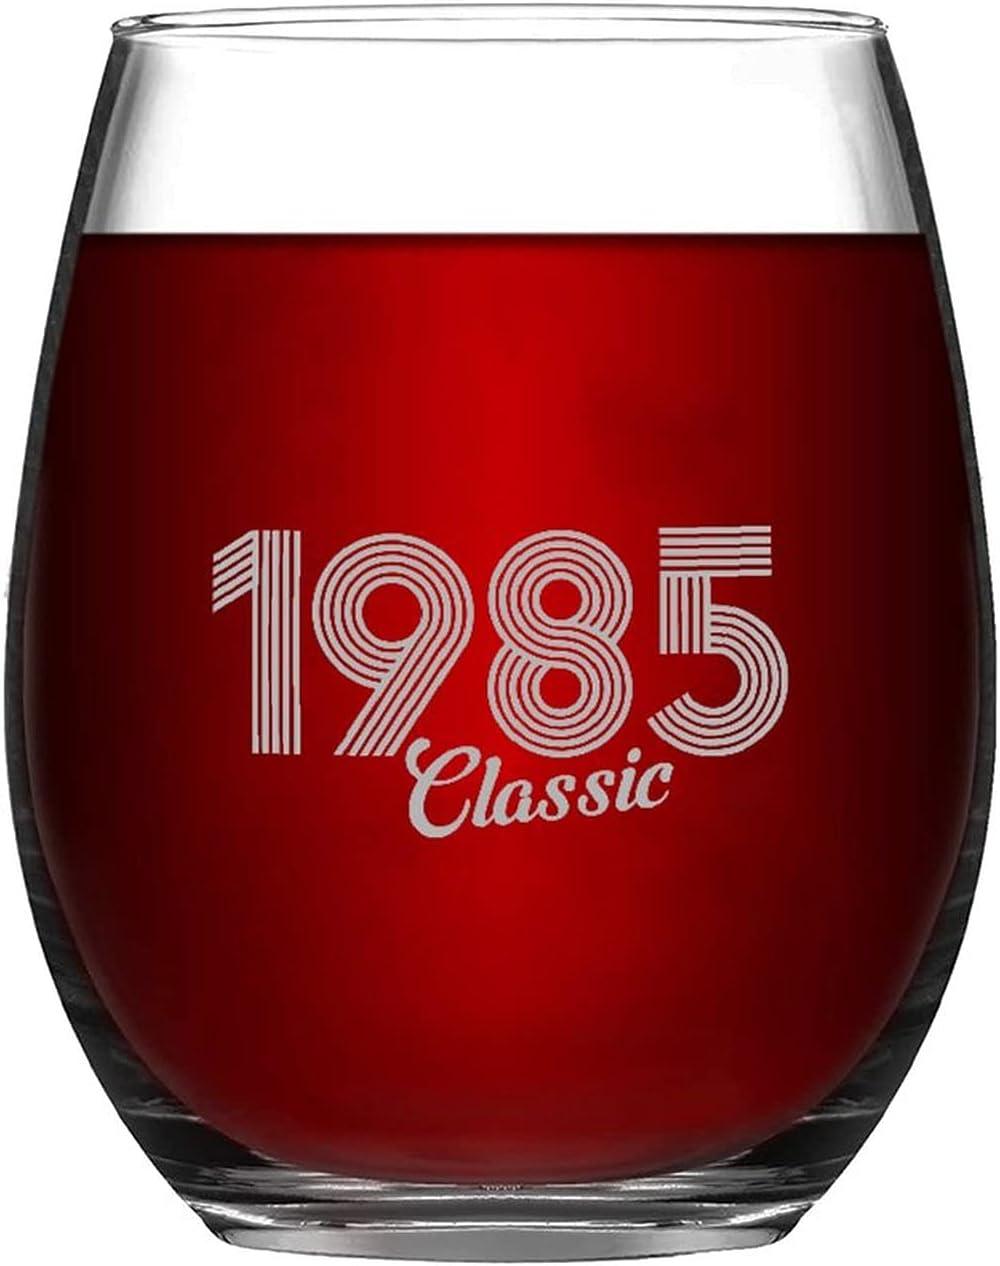 Classic 1985 Vintage Years Wine Stemless Austin Mall Glasses Popular overseas Annivers Custom